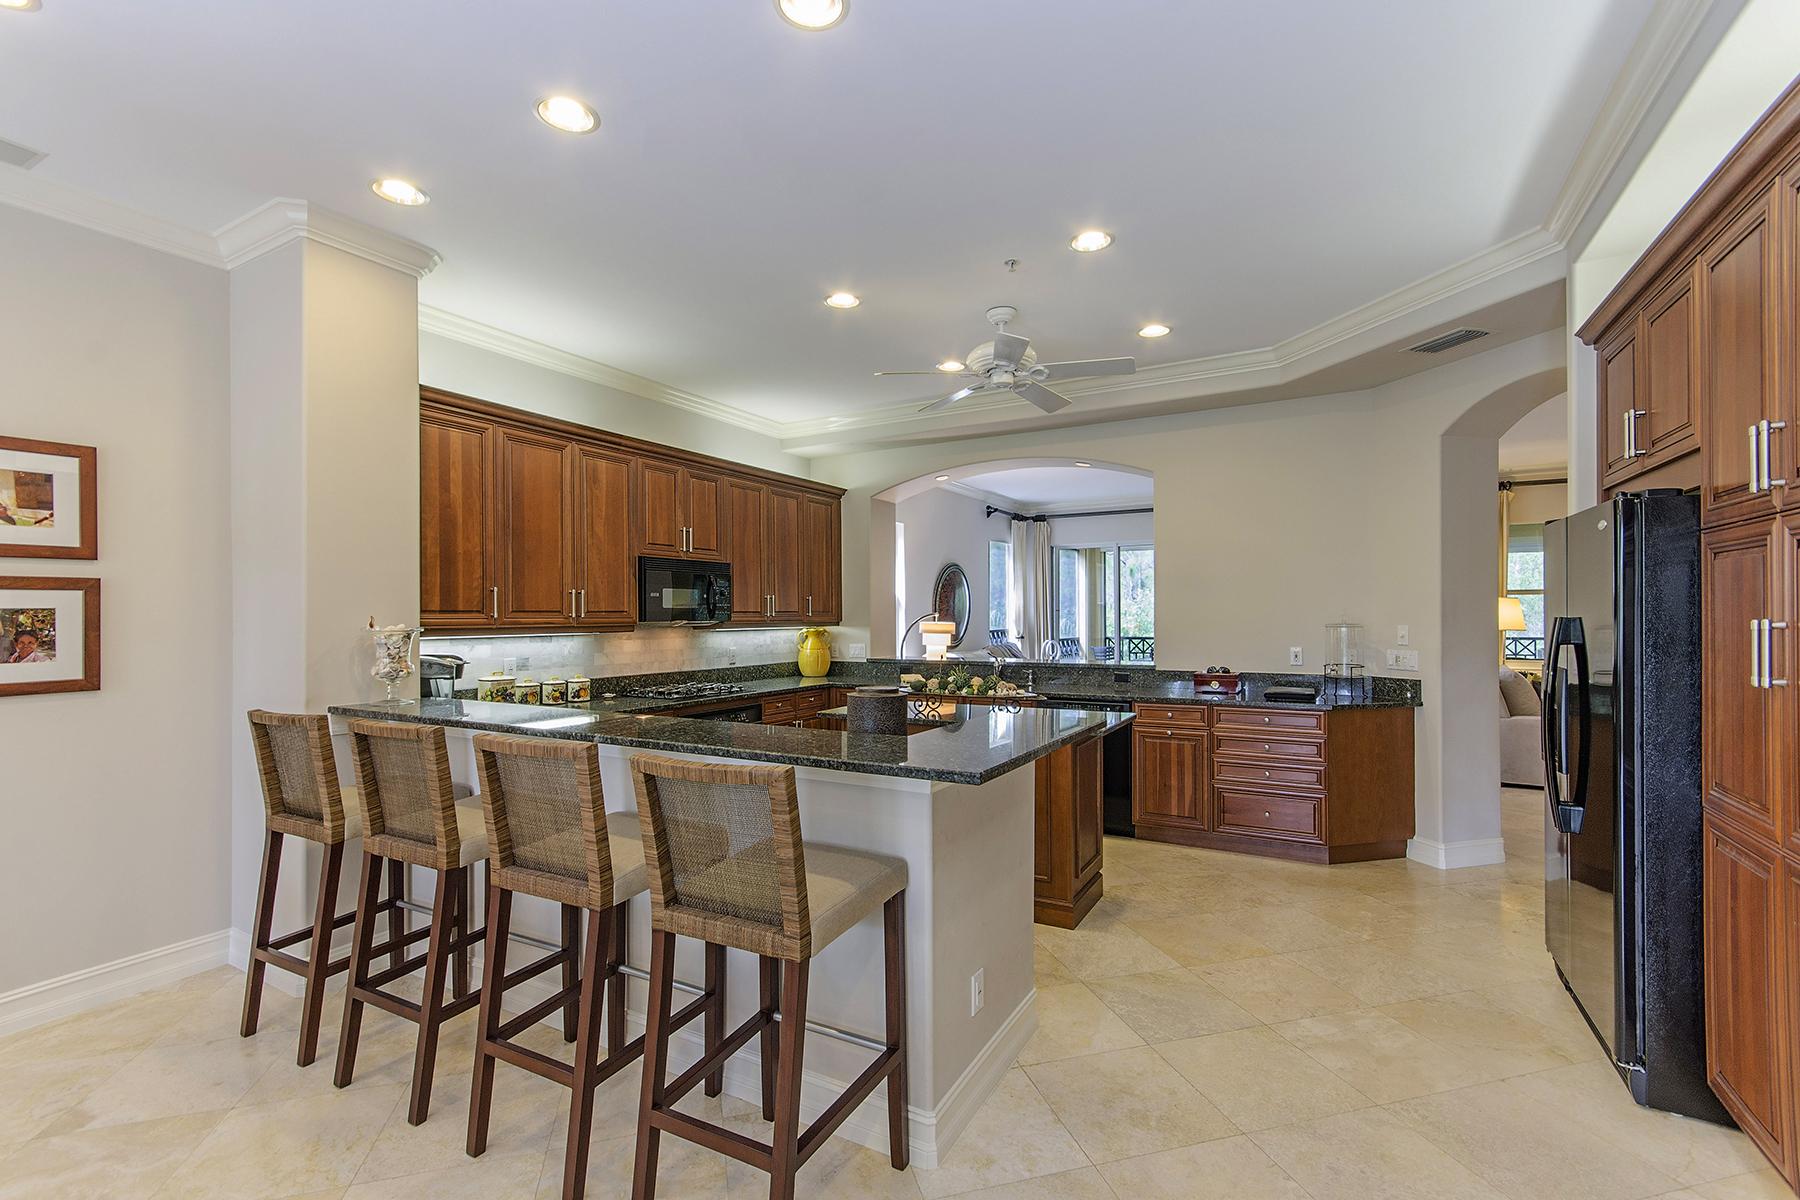 Condominium for Sale at Naples 2805 Tiburon Blvd E 102, Naples, Florida 34109 United States